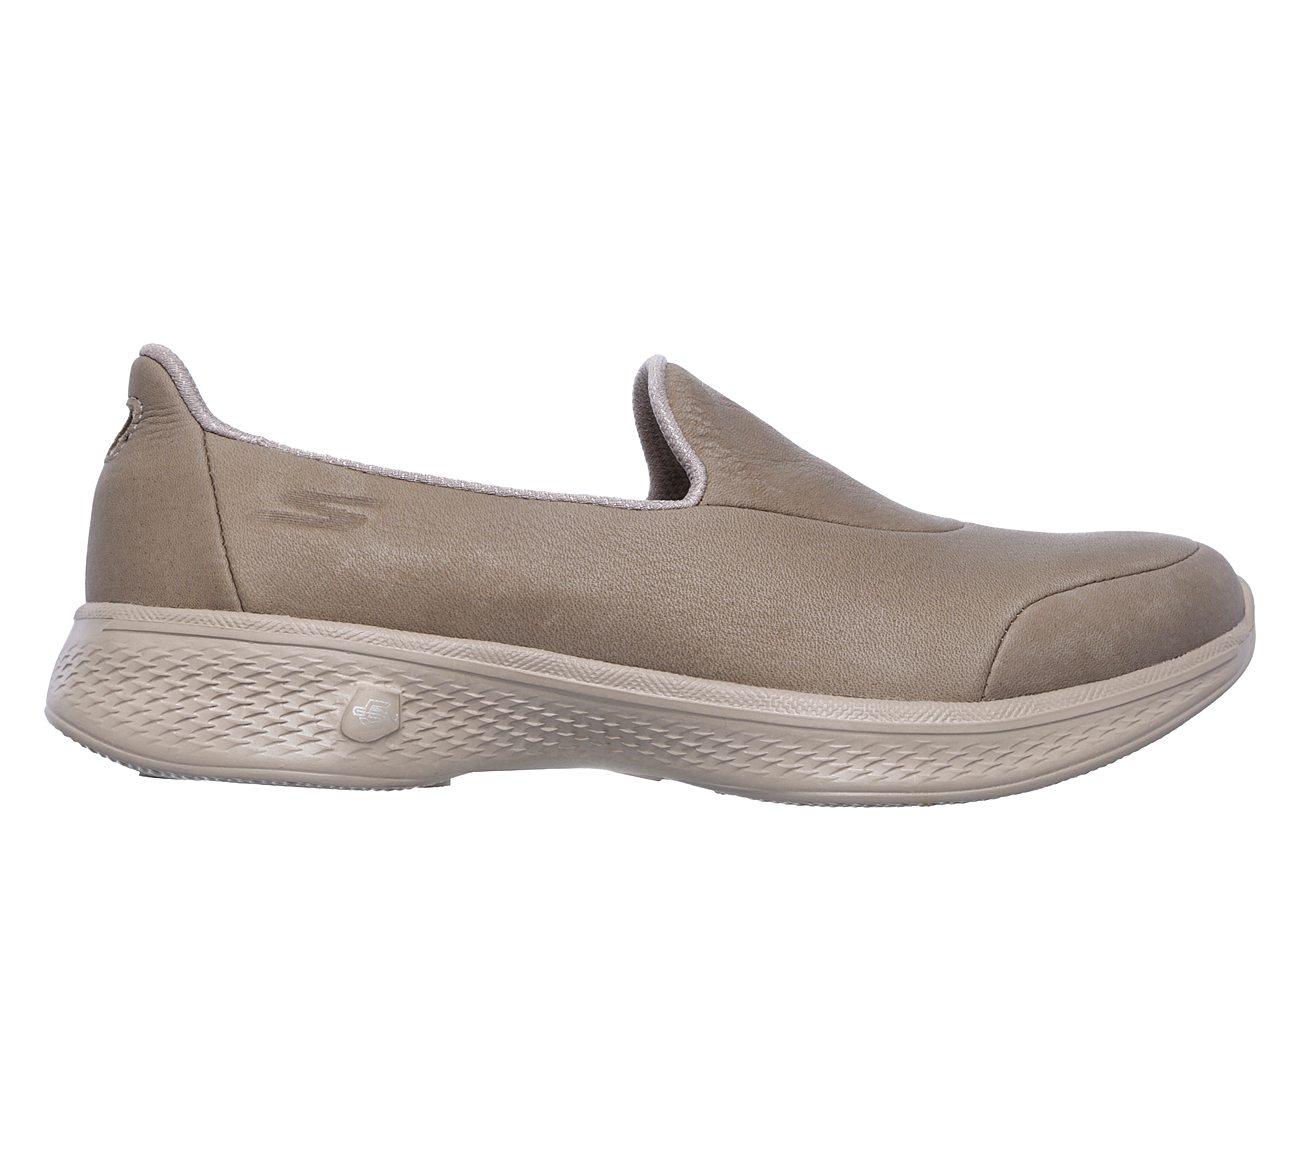 Buy SKECHERS Skechers GOwalk 4 - Desired Skechers Performance Shoes only  $70.00